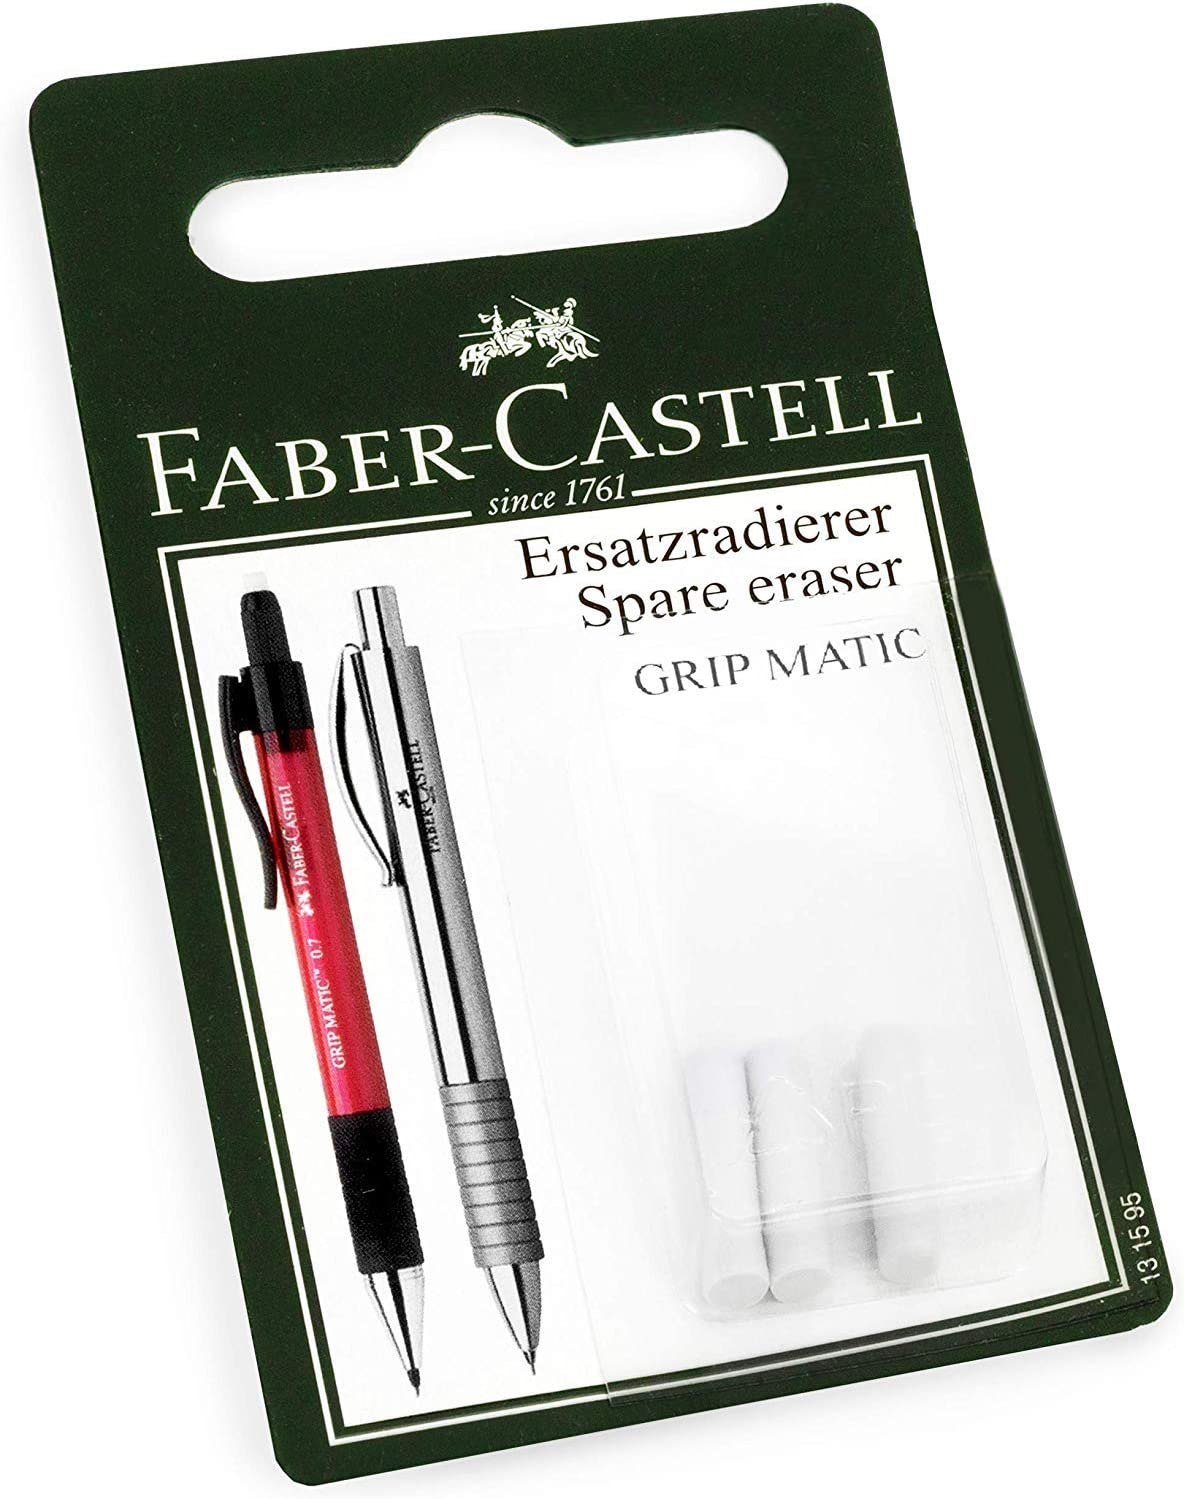 Faber-Castell Grip Matic Eraser Rubber White Blister - Refills 5 ☆ Portland Mall popular